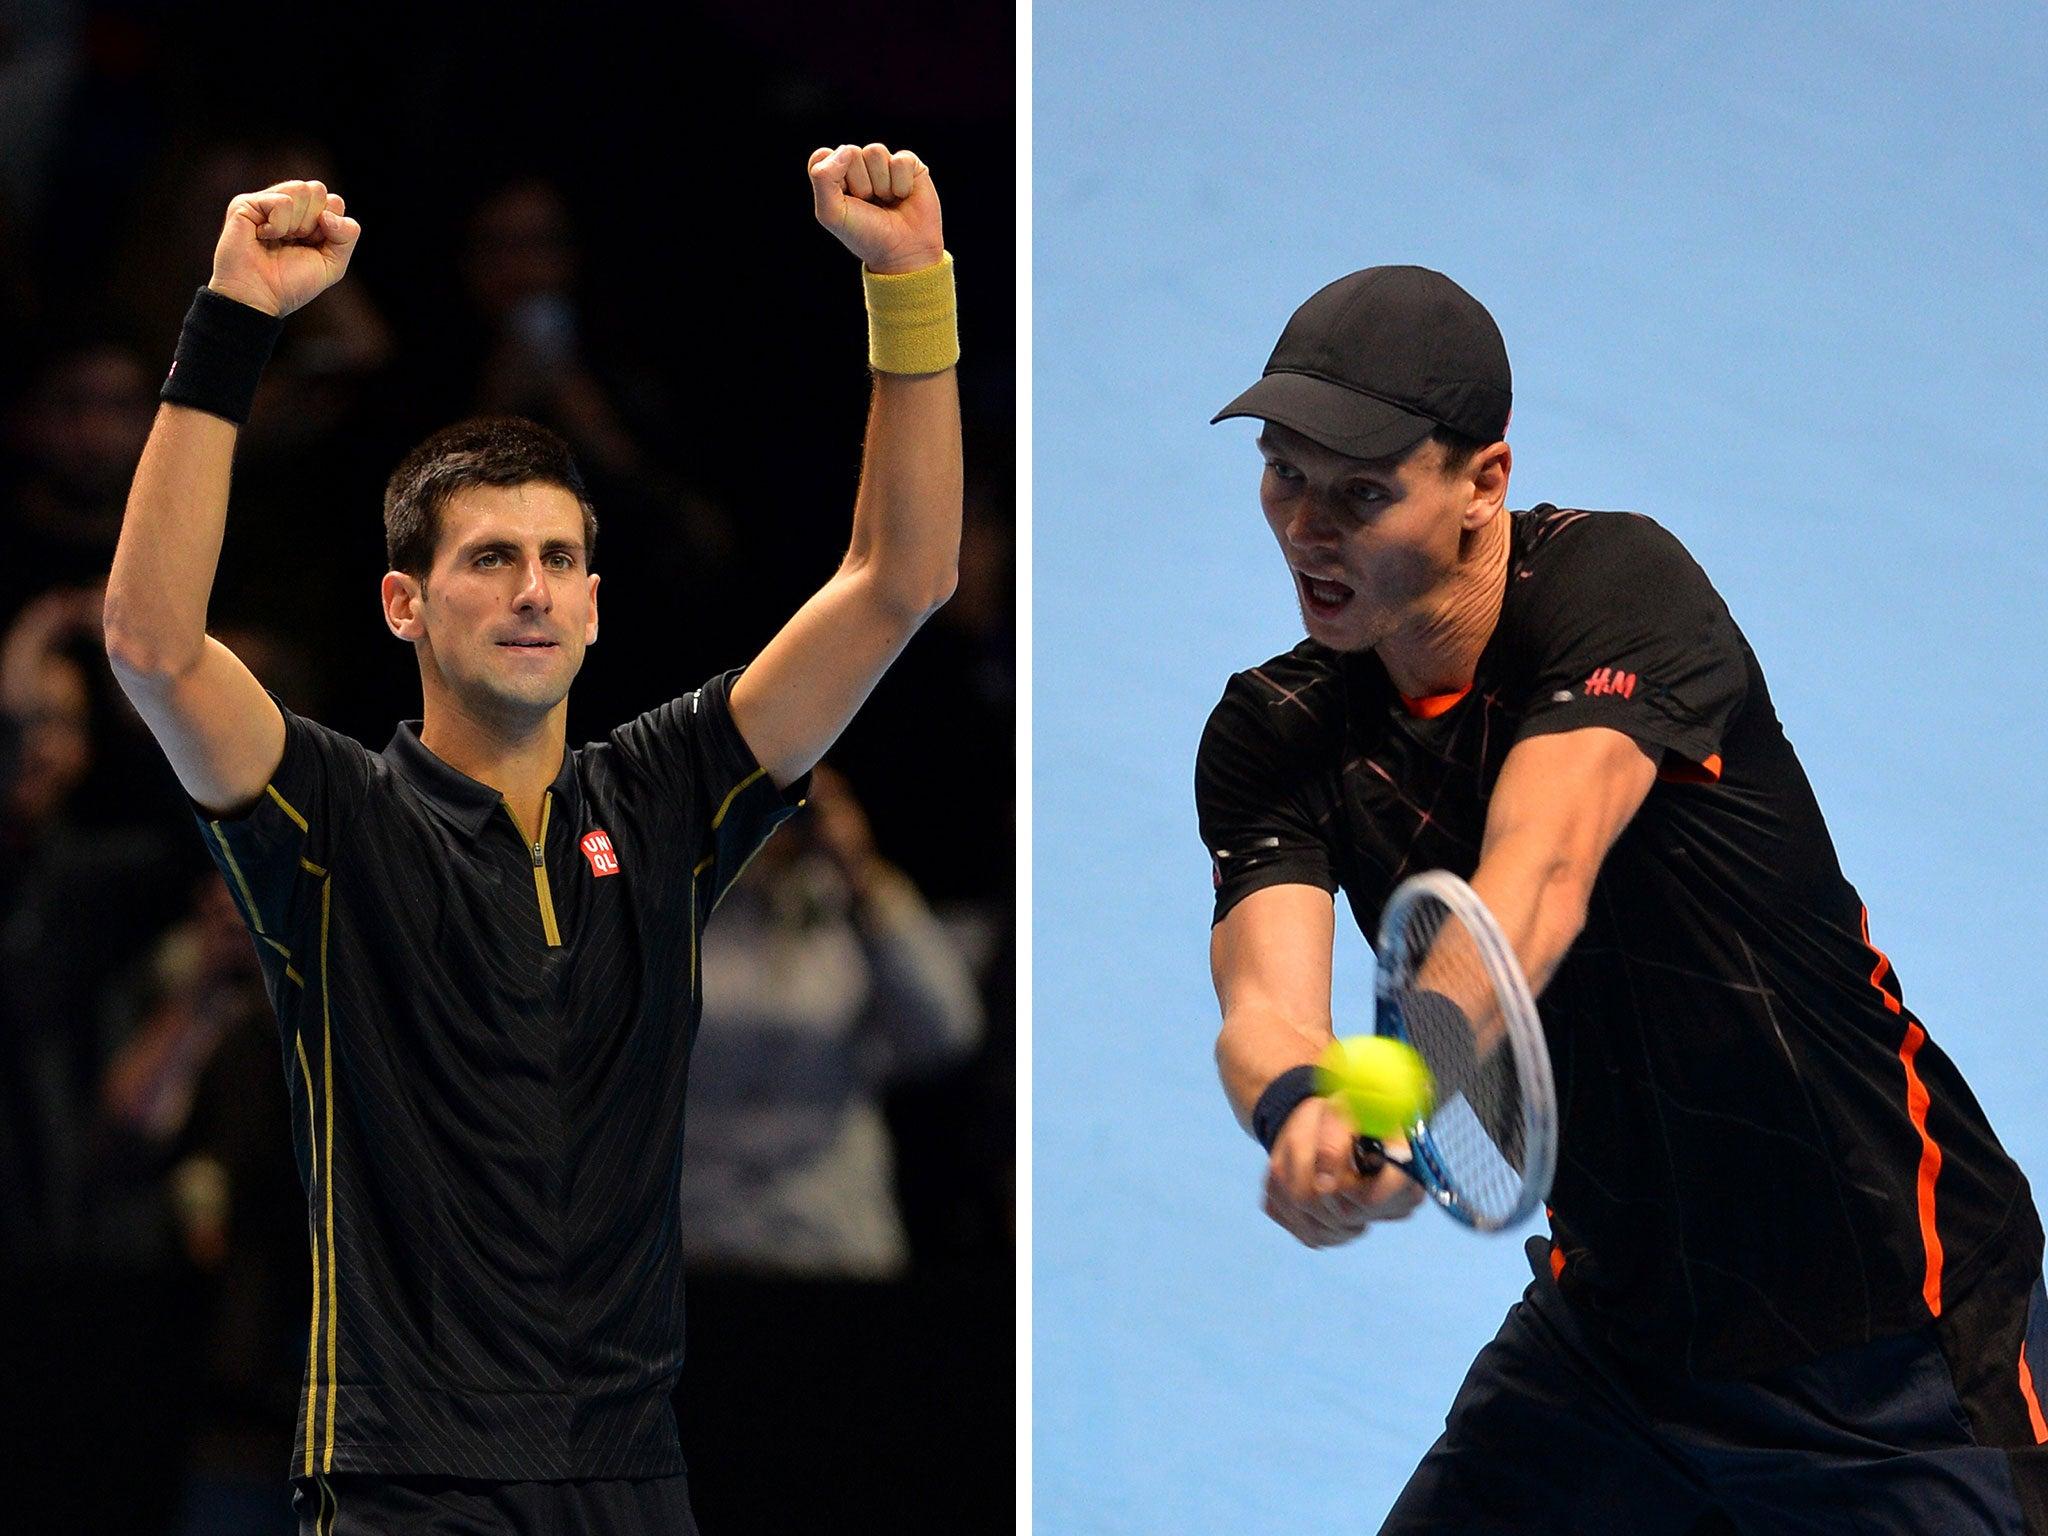 Djokovic vs berdych betting expert sports gals sports betting uganda fixtures